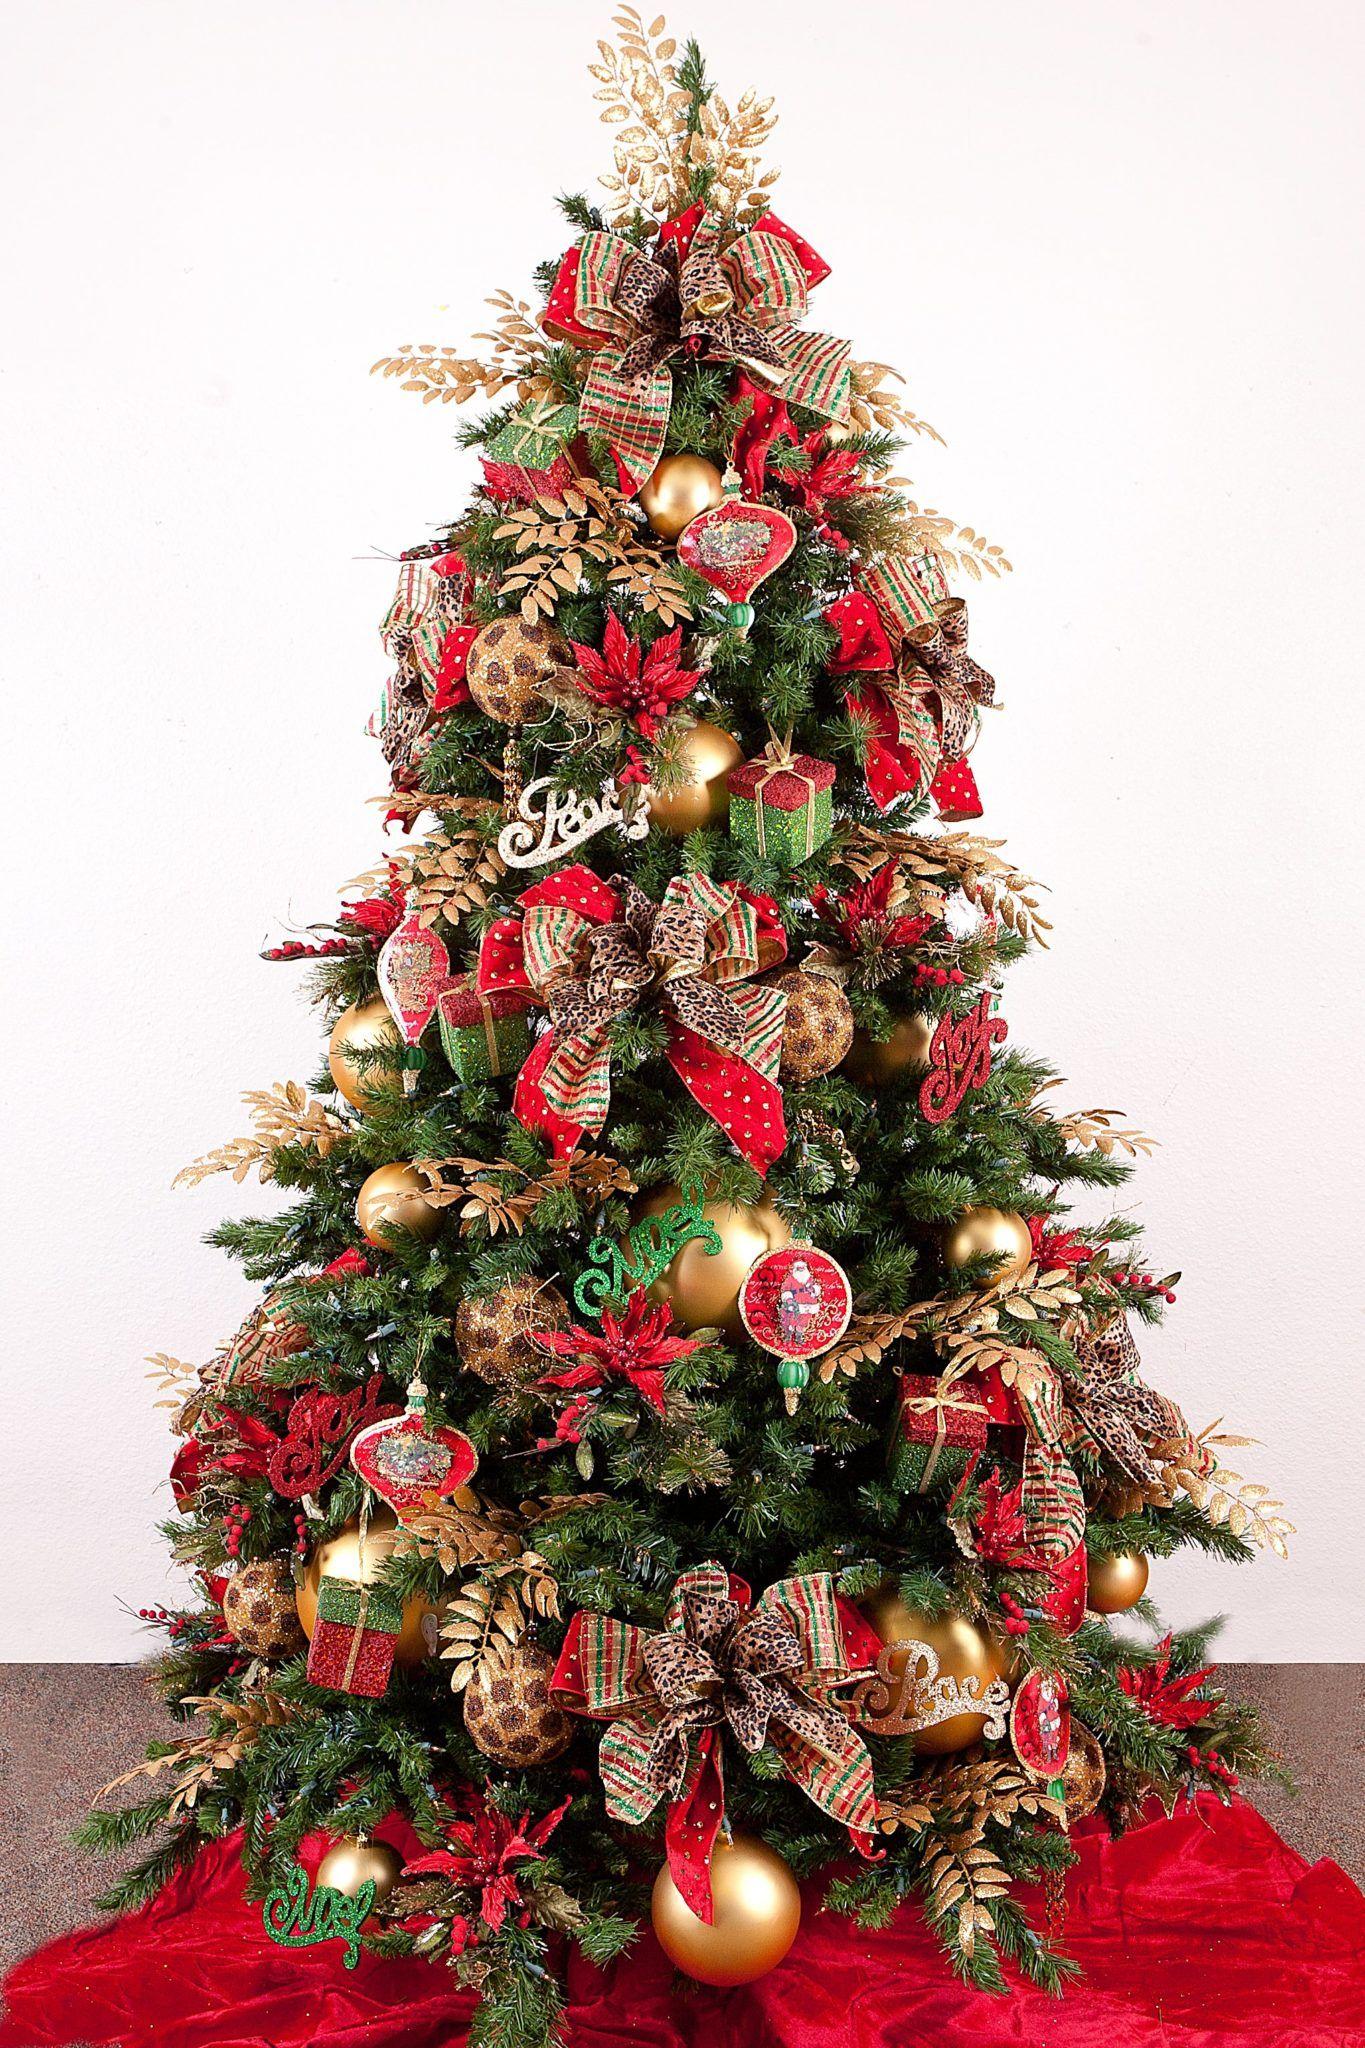 Arvores De Natal Arvore De Natal Vermelha Decoracao De Arvore